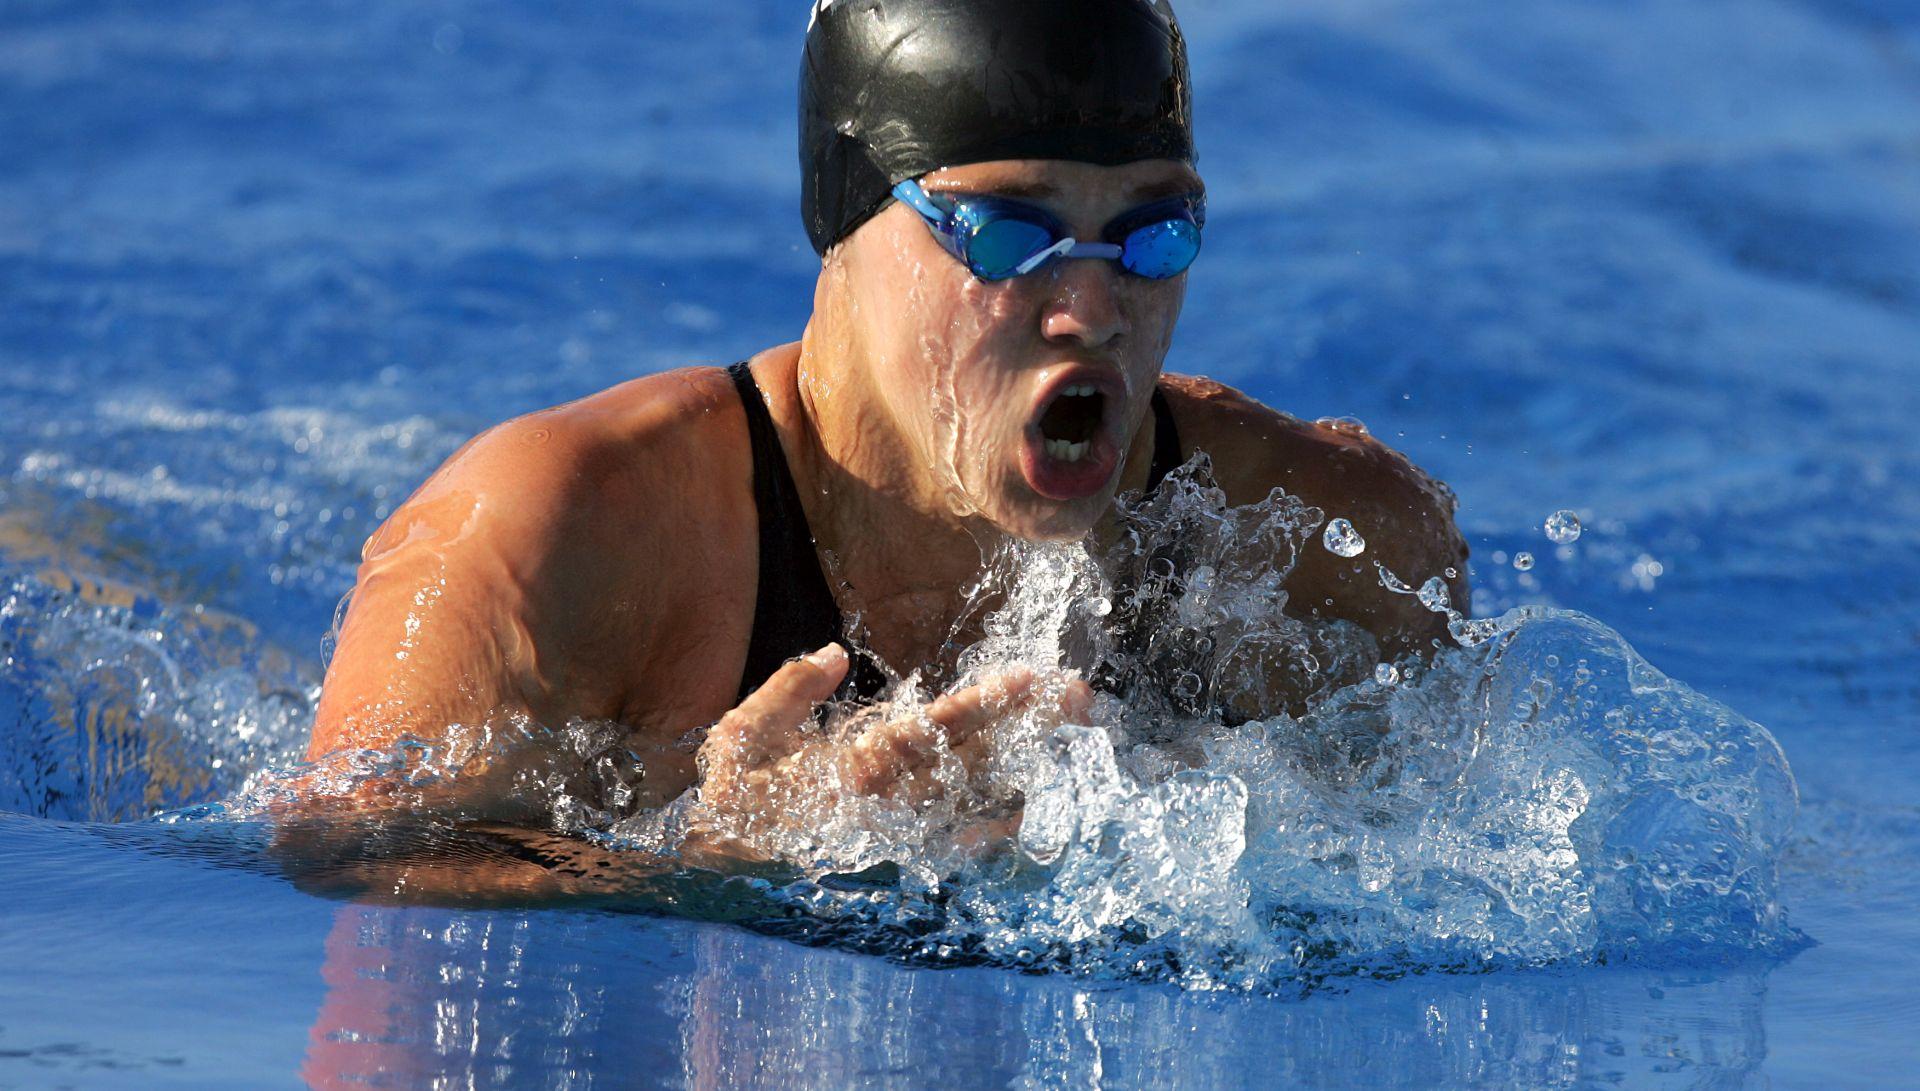 SP plivanje (25 m): Lončar 16. na 200 leđno, Ana Radić 18. na 200 prsno